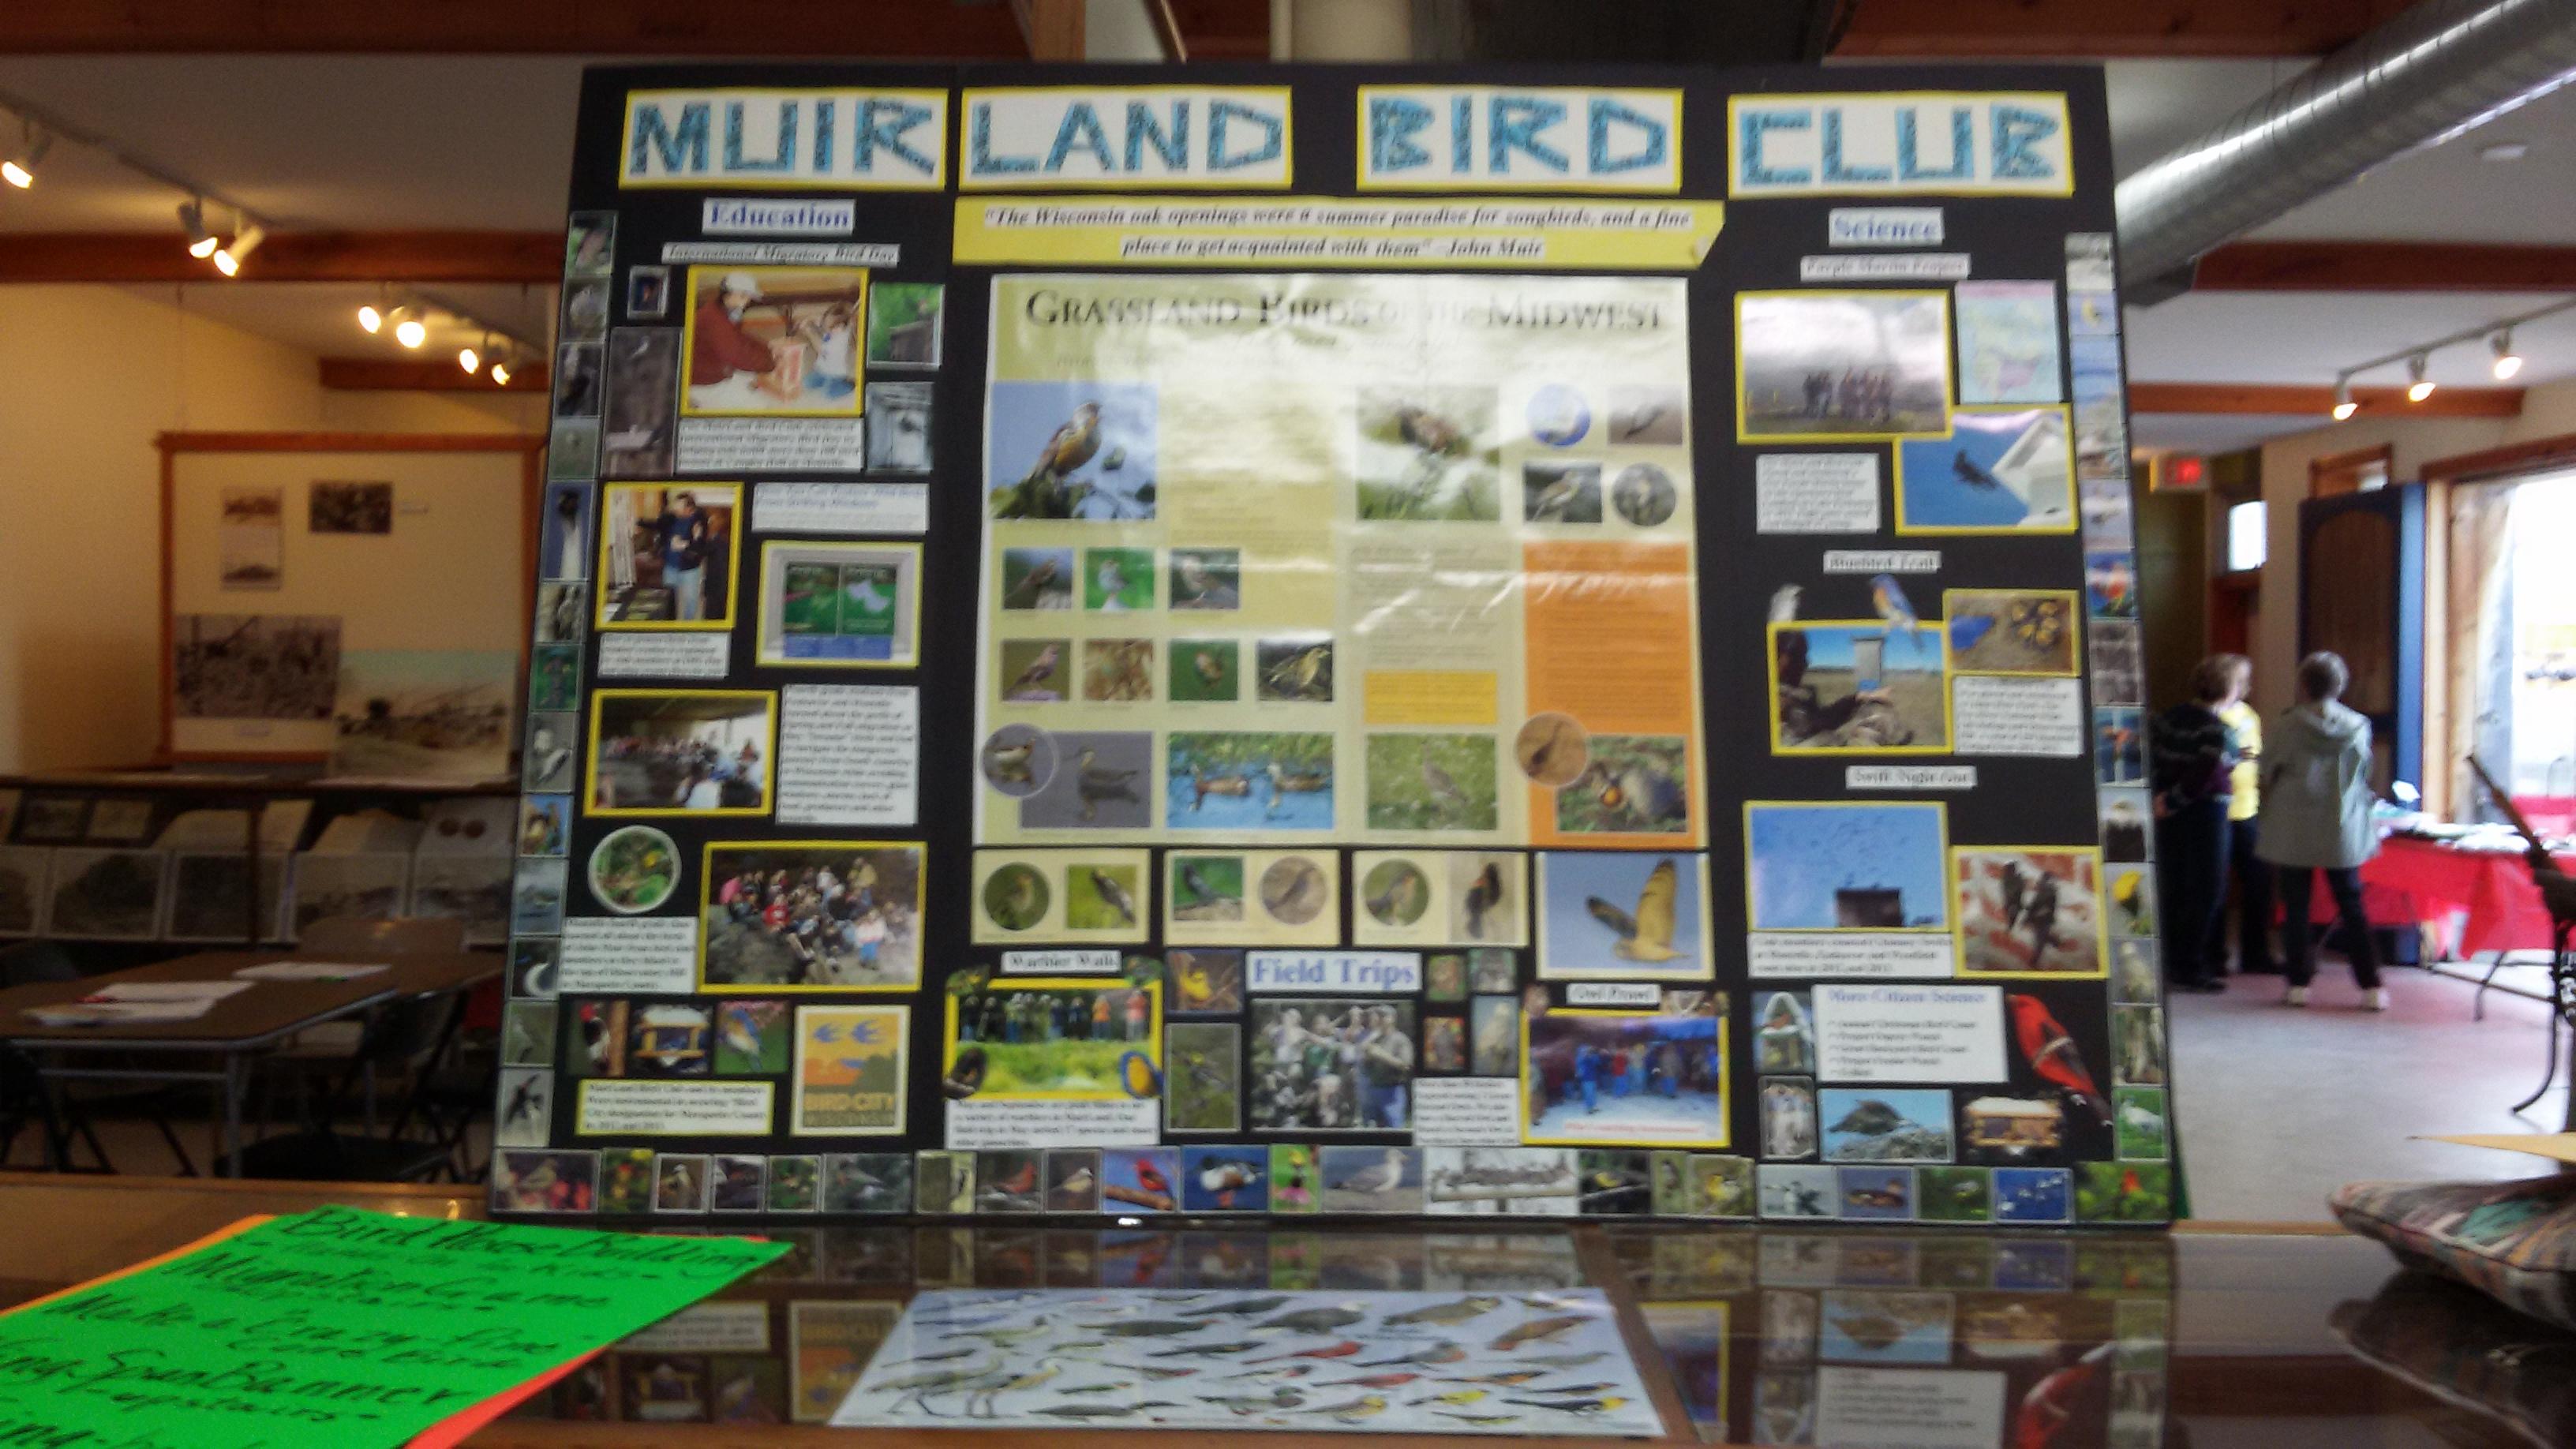 Muirland Bird Club